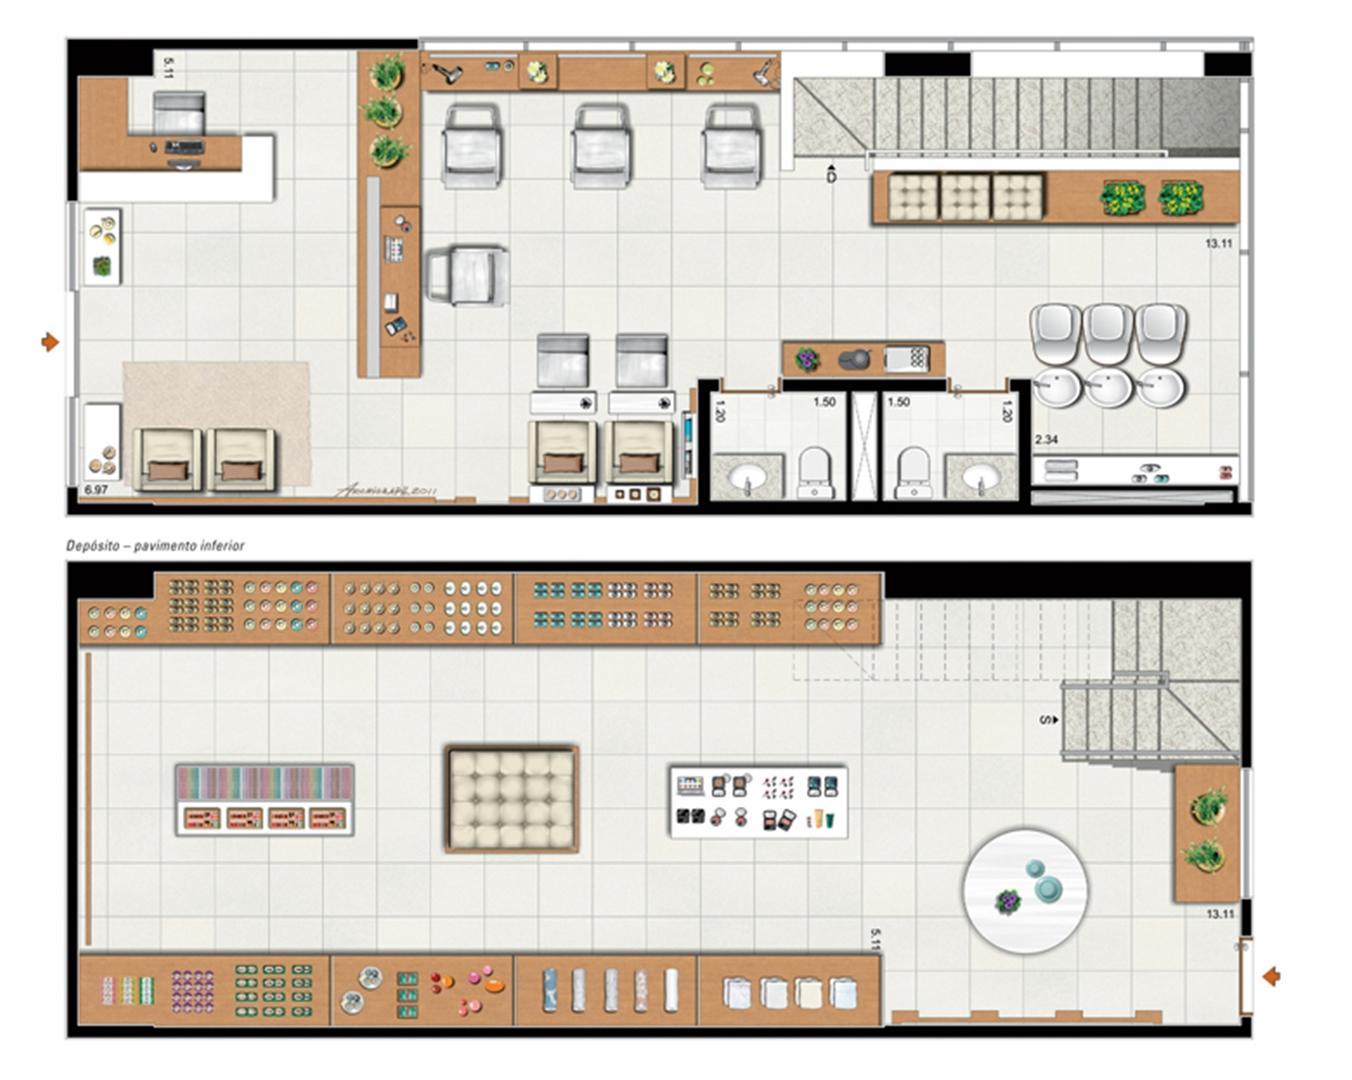 Planta de 104 m² privativos duplex | Vega – Salas Comerciais na  Asa Norte  - Brasília - Distrito Federal